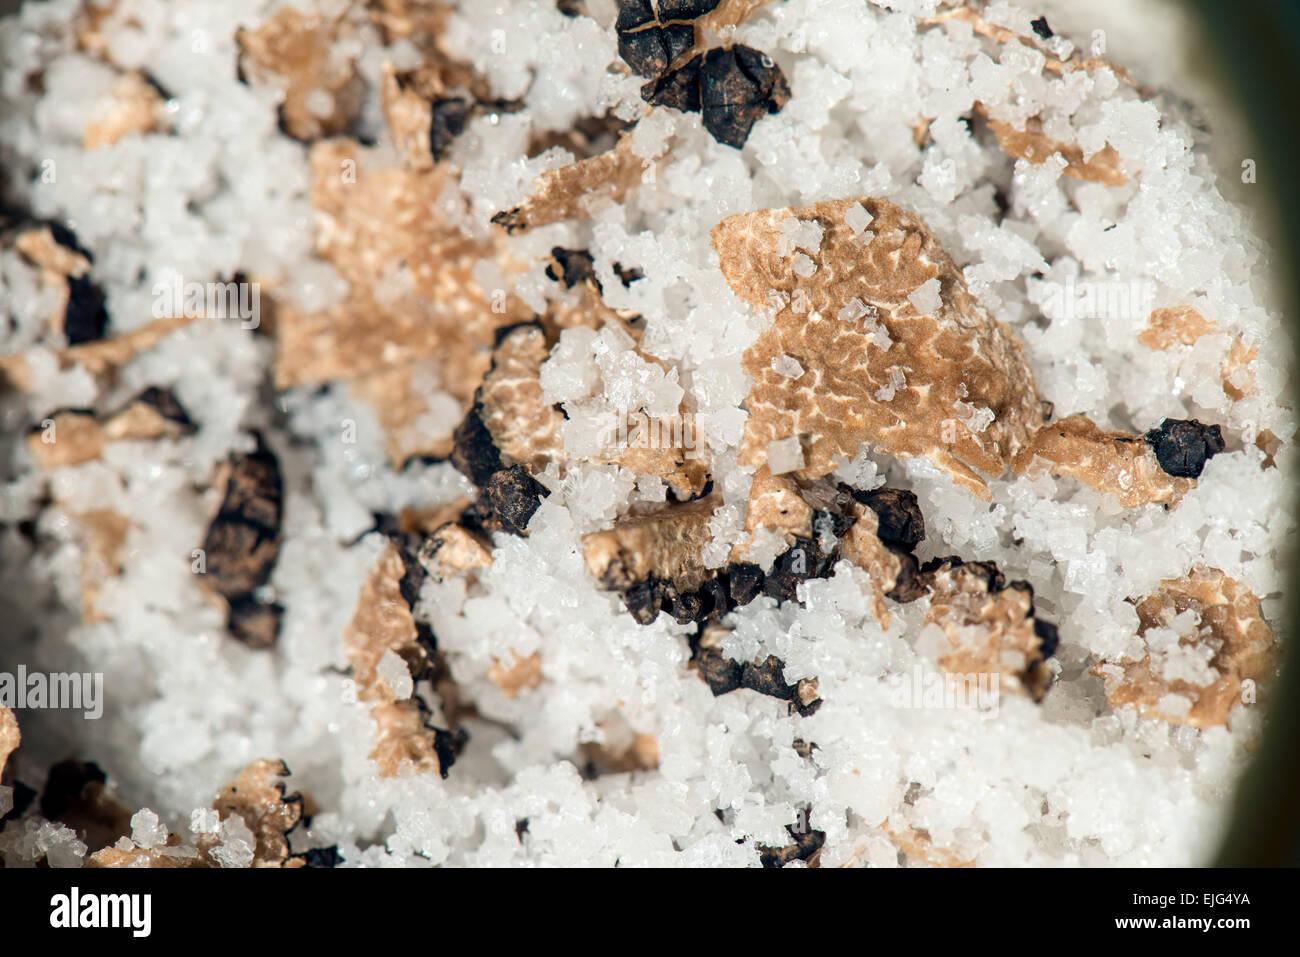 Burgund Truffles cut in half and preserved with salt Perigord noir Dordogne France - Stock Image